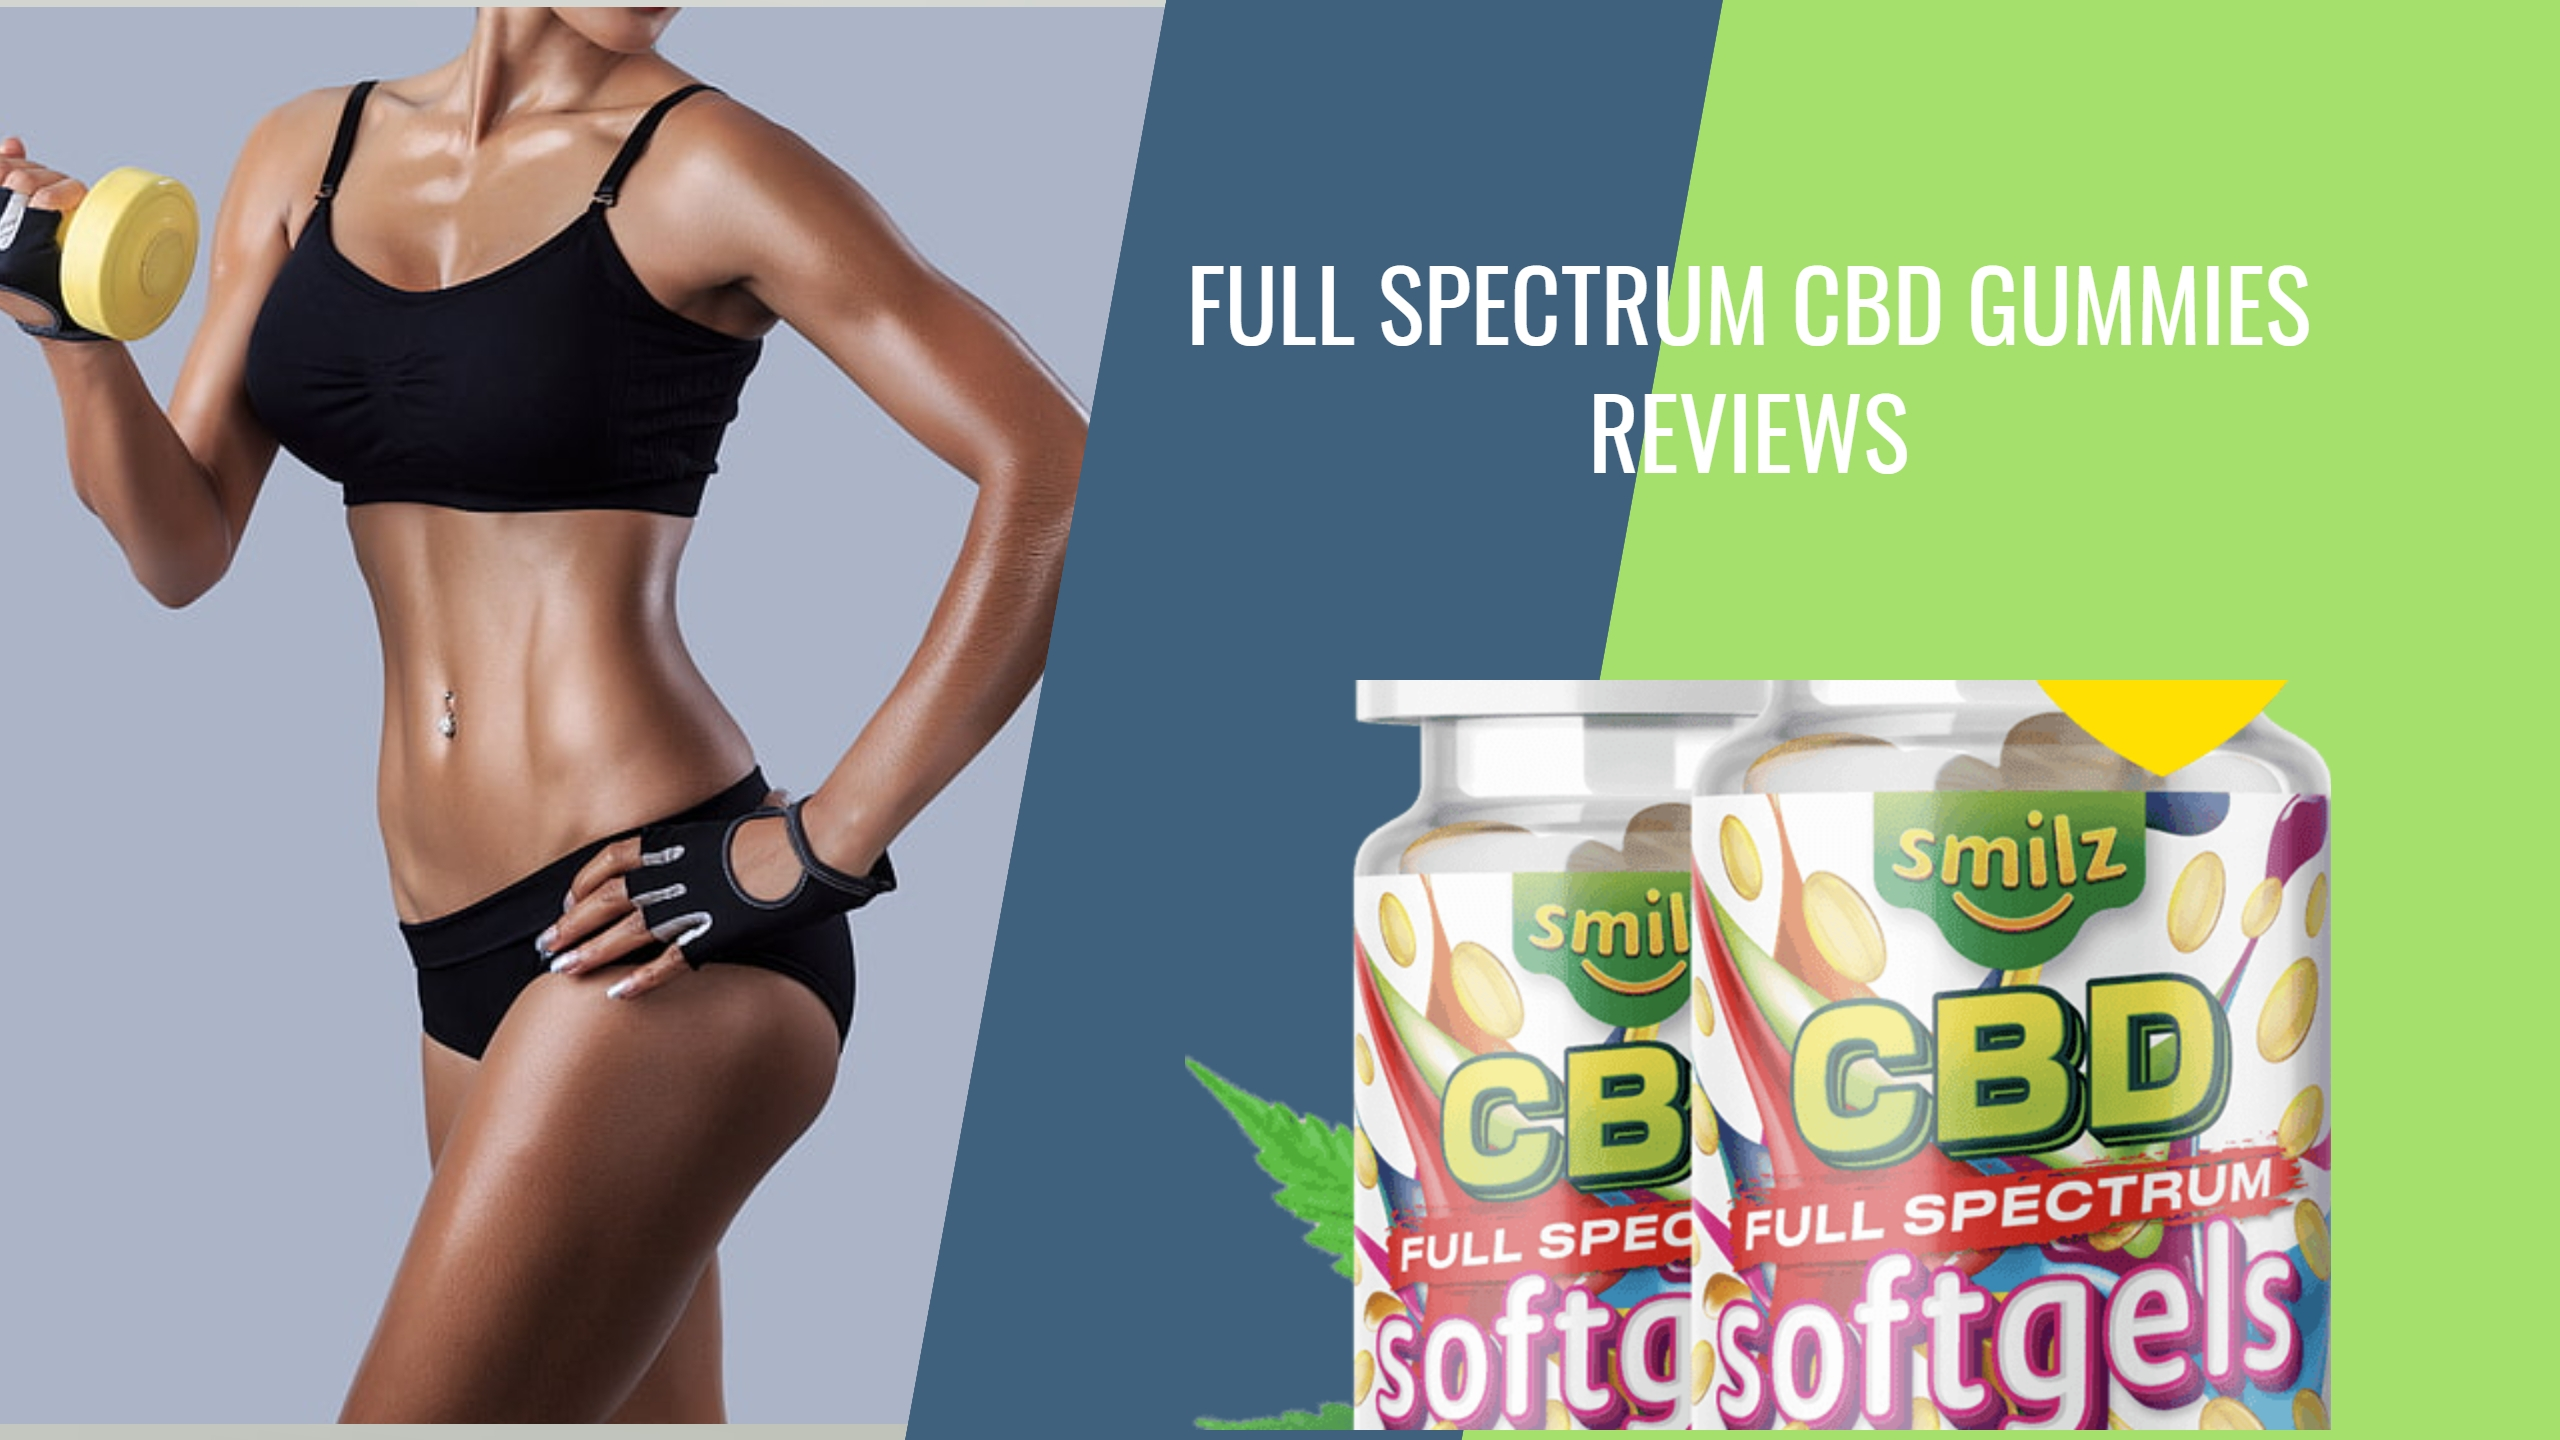 FULL SPECTRUM CBD GUMMIES REVIEWS (@fullspectrumcbd) Cover Image